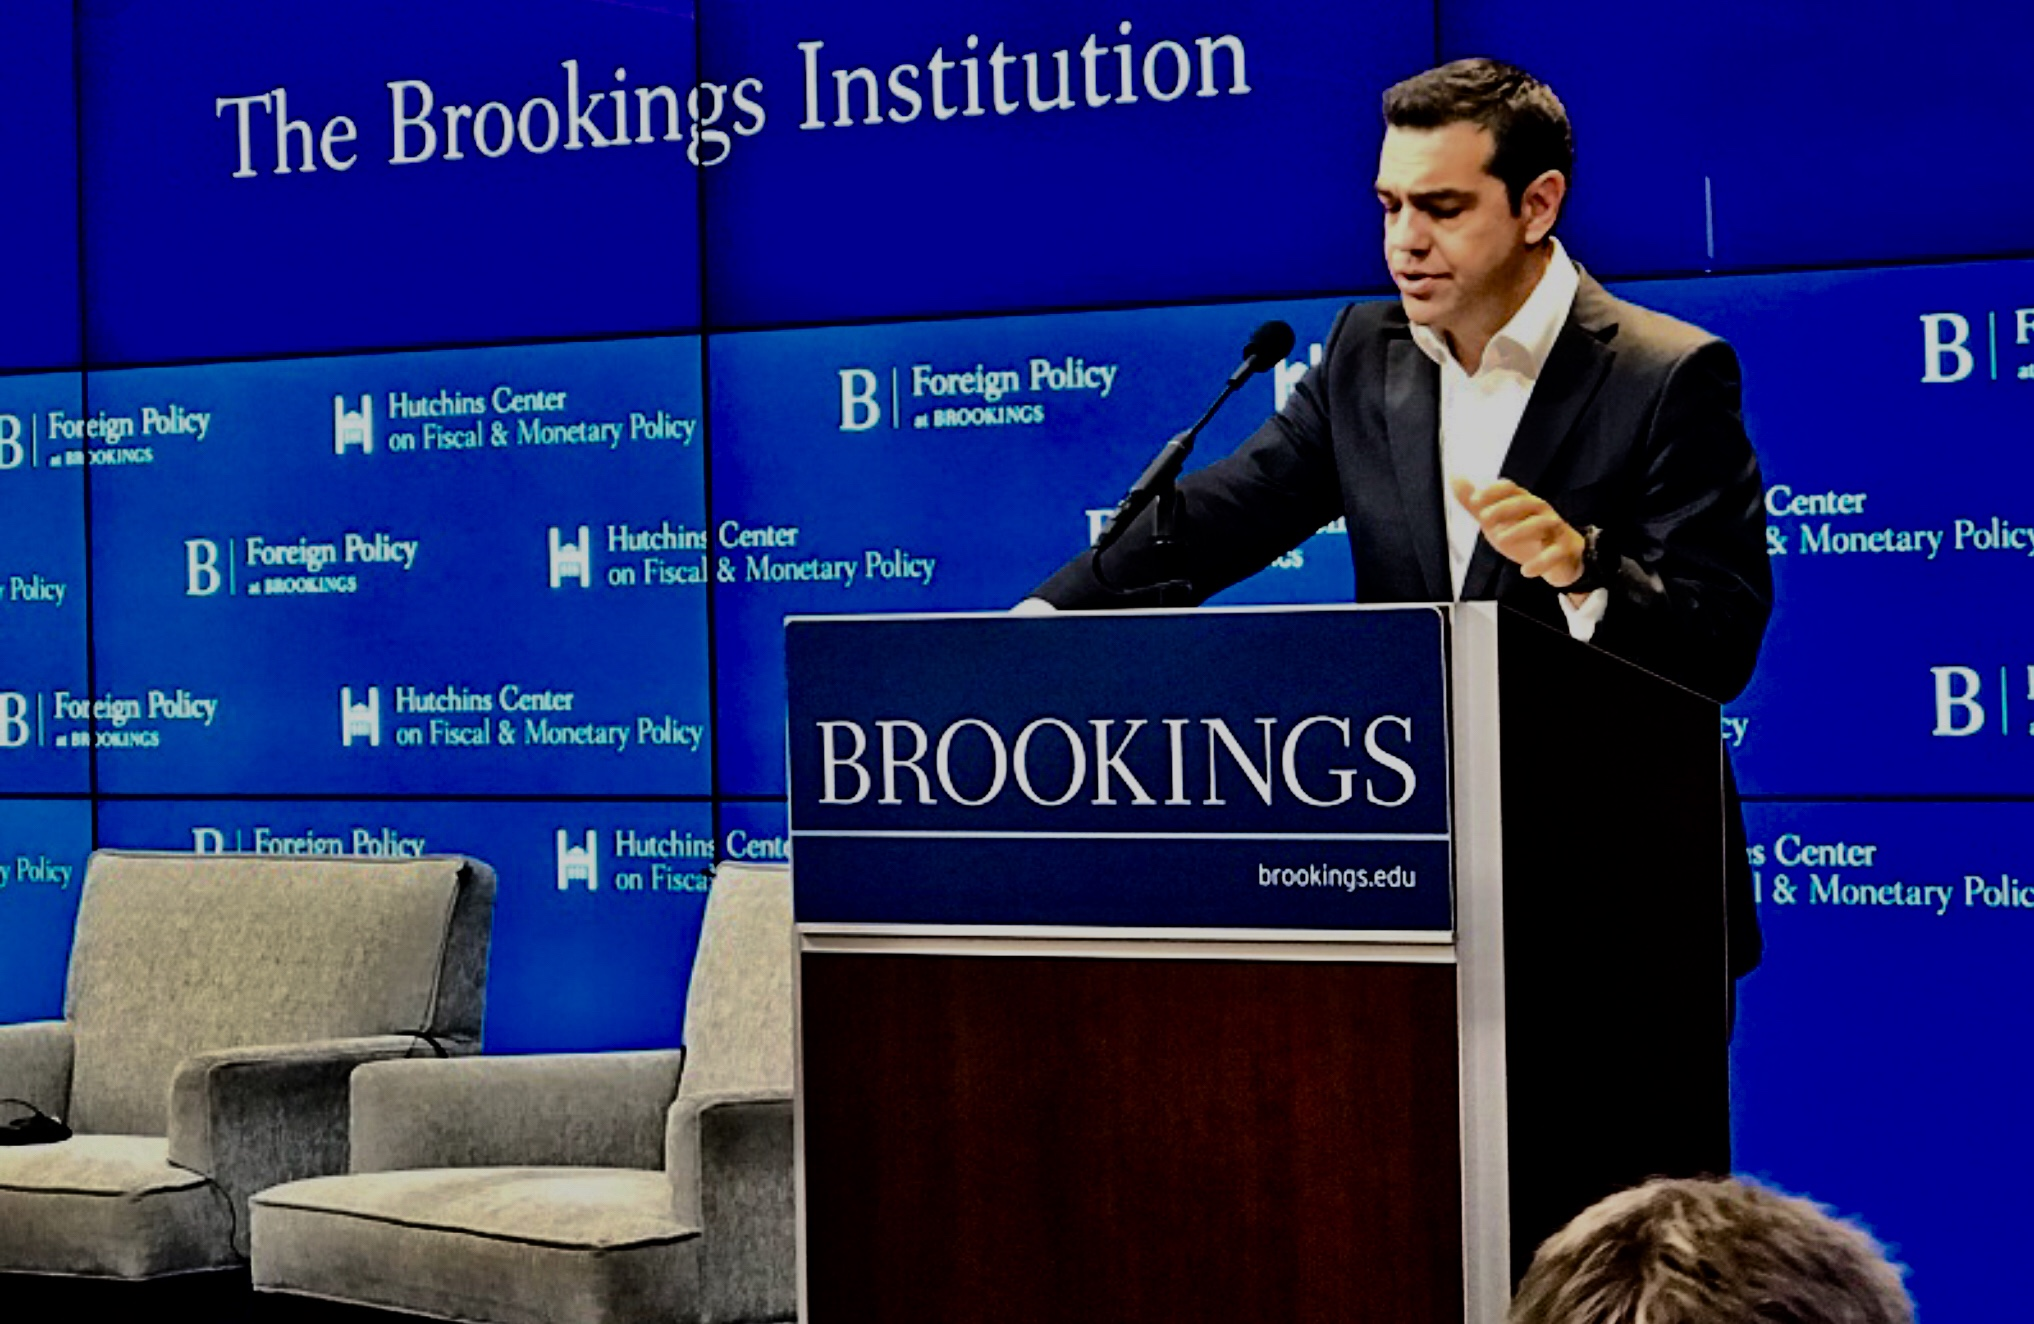 FAZ: «Ο Αλέξης Τσίπρας θα μπορούσε να μείνει στην ιστορία ως ο πολιτικός που απελευθέρωσε την Ελλάδα»